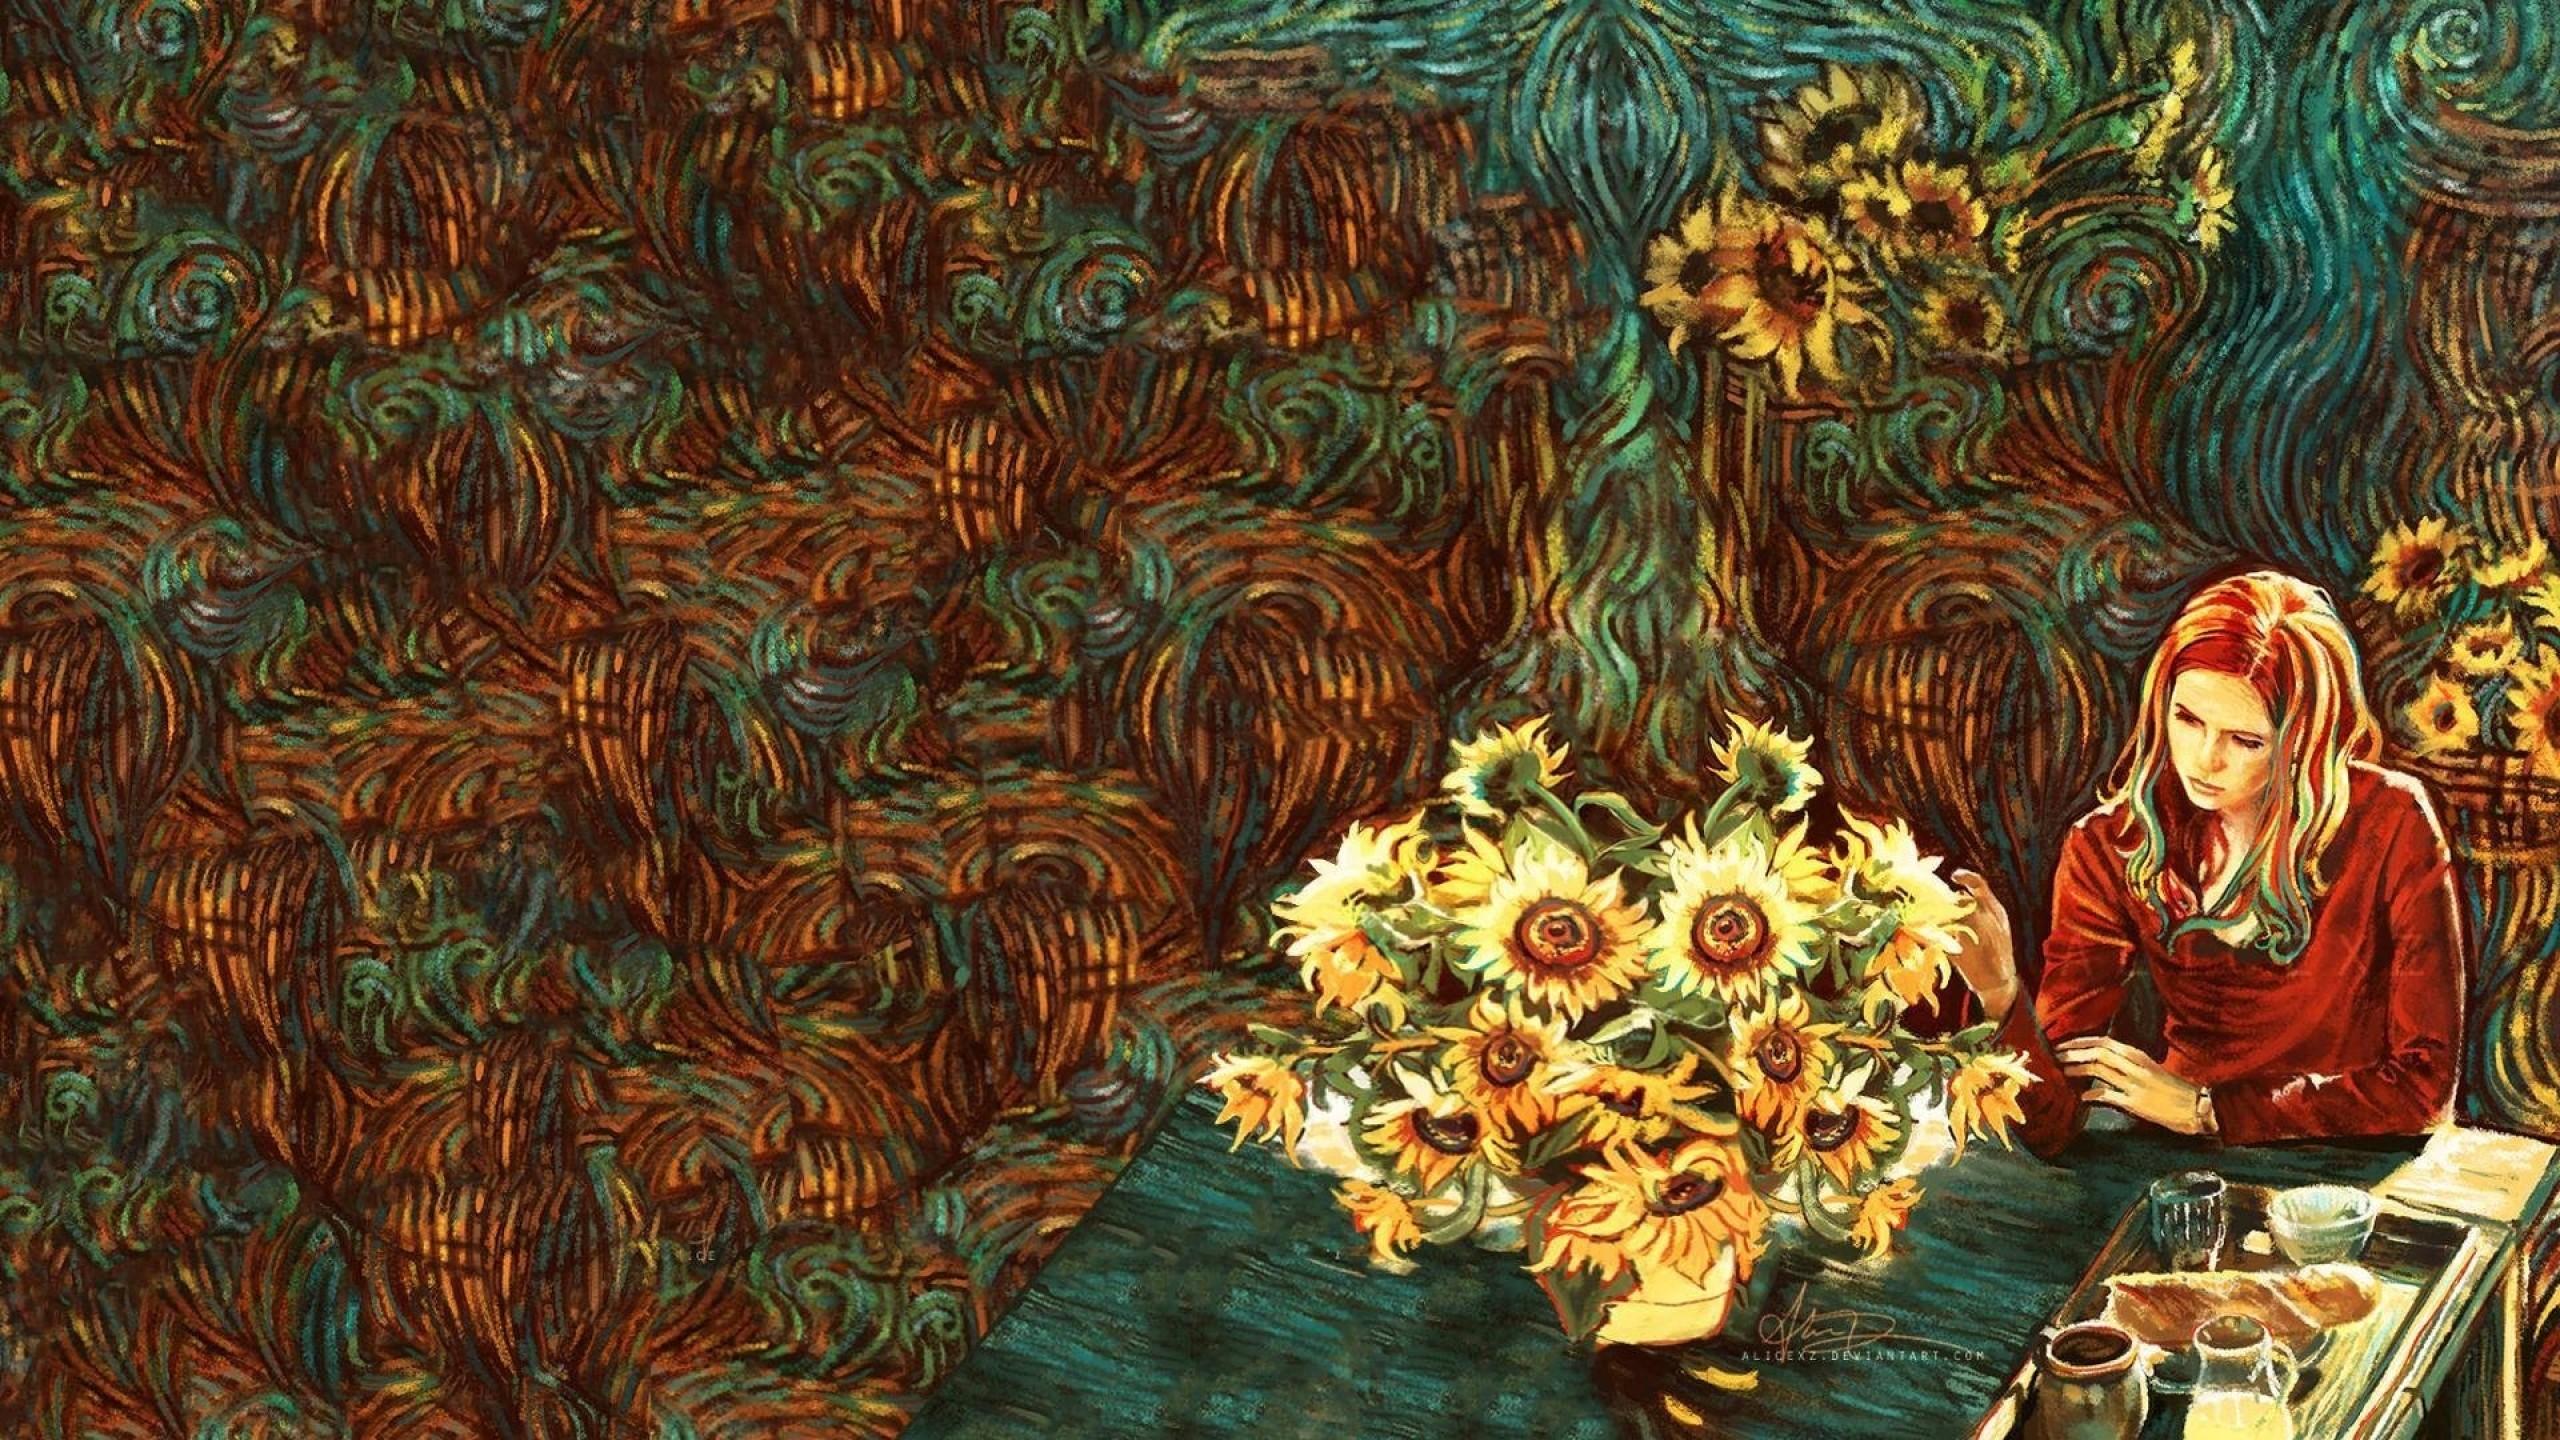 1920x1200 Vincent Van Gogh Wallpaper, Still Life Vase With Fourteen Sunflowers Vincent Van Gogh 1200x1920